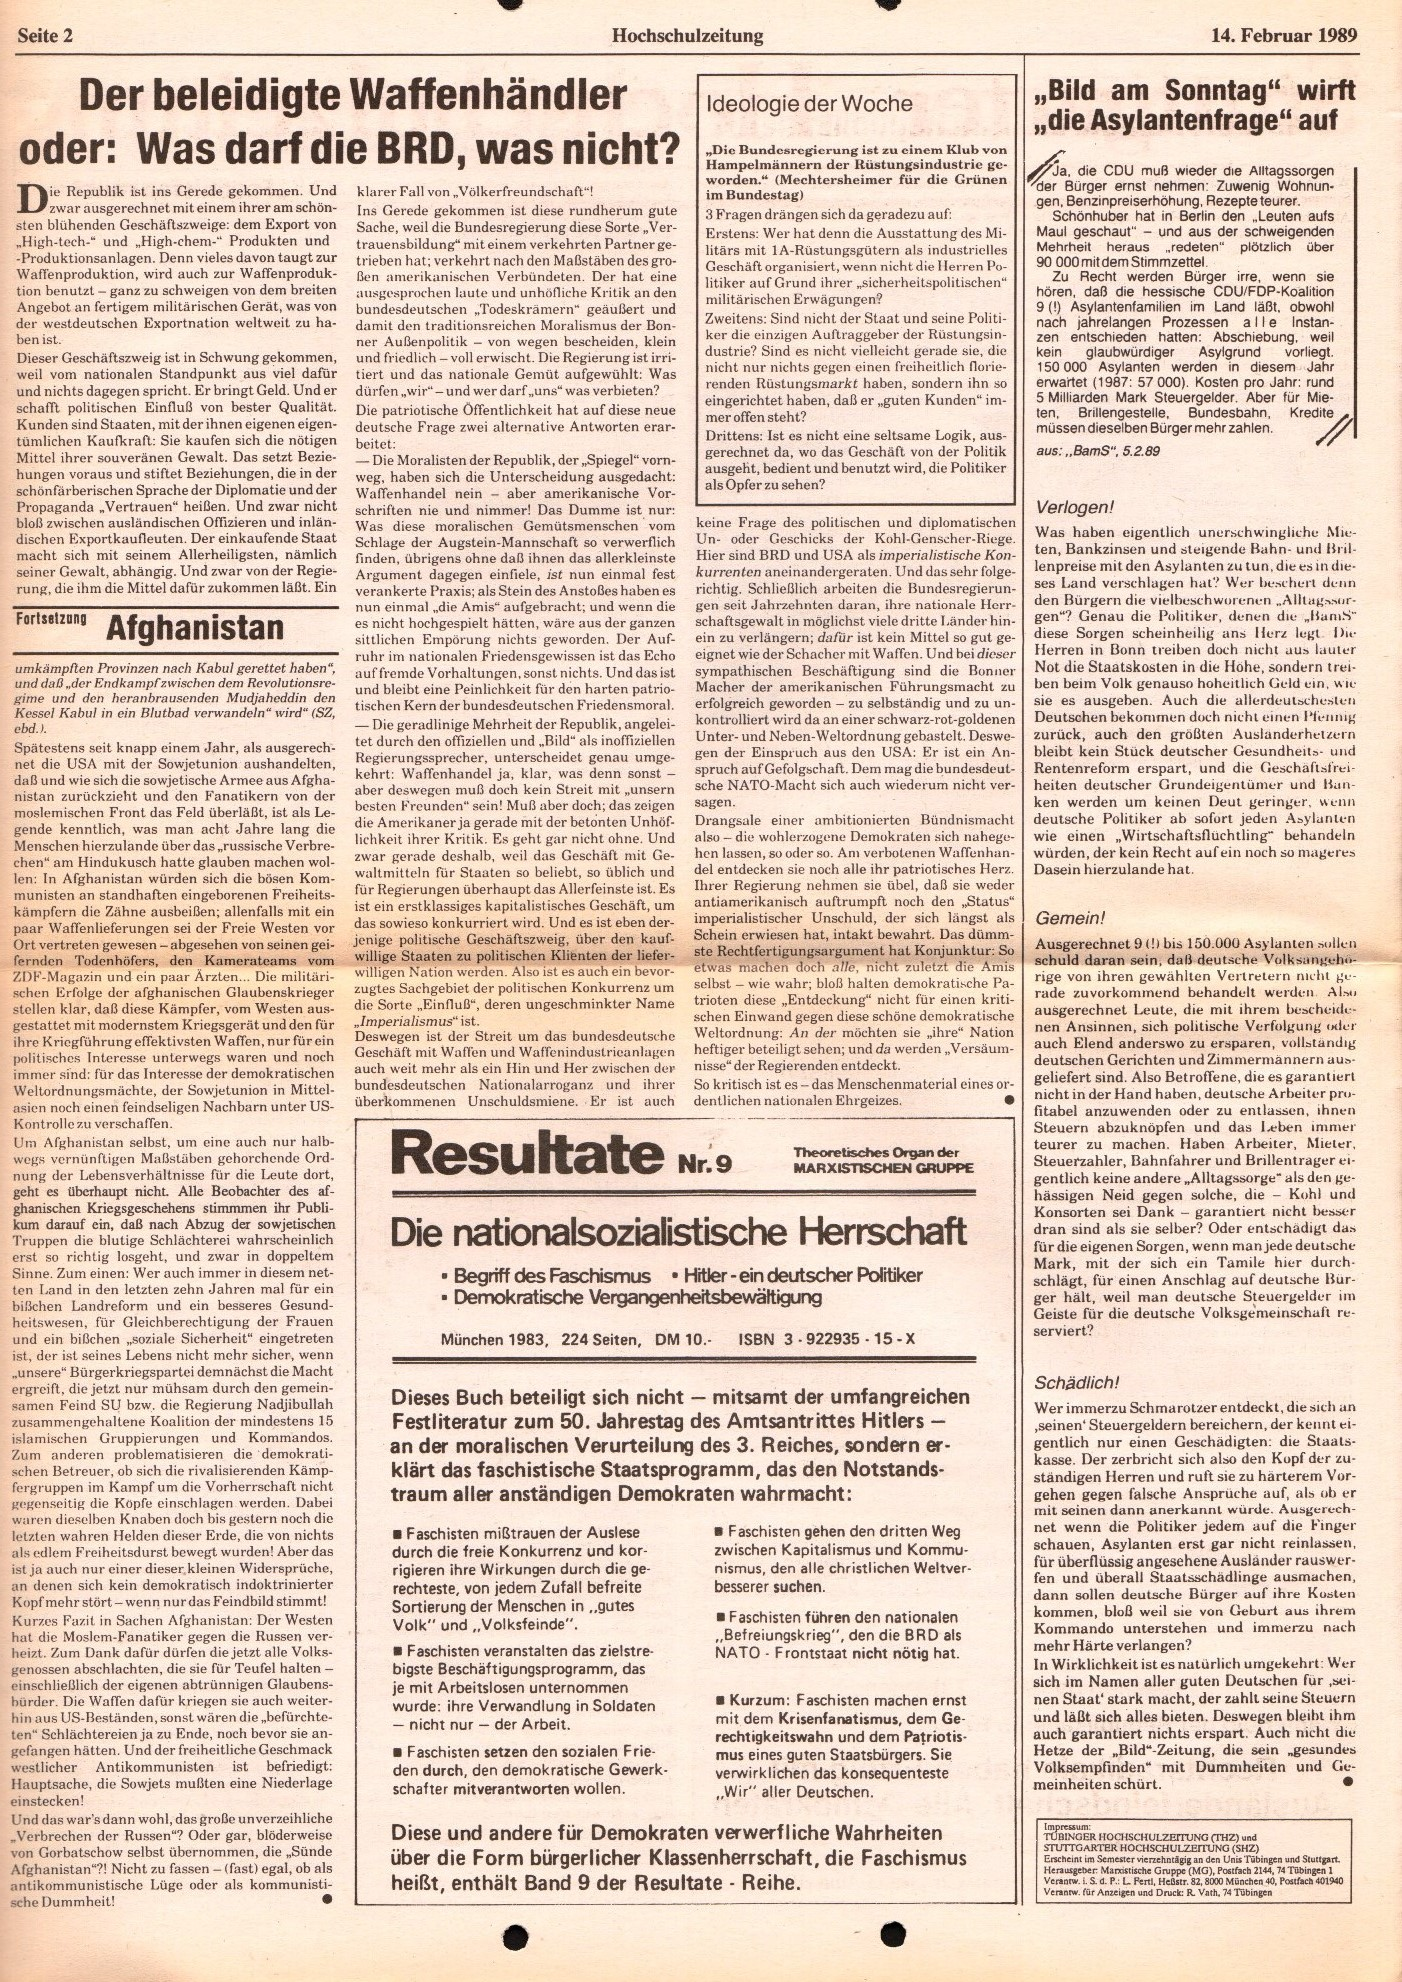 Stuttgart_MG_Hochschulzeitung_1989_03_02